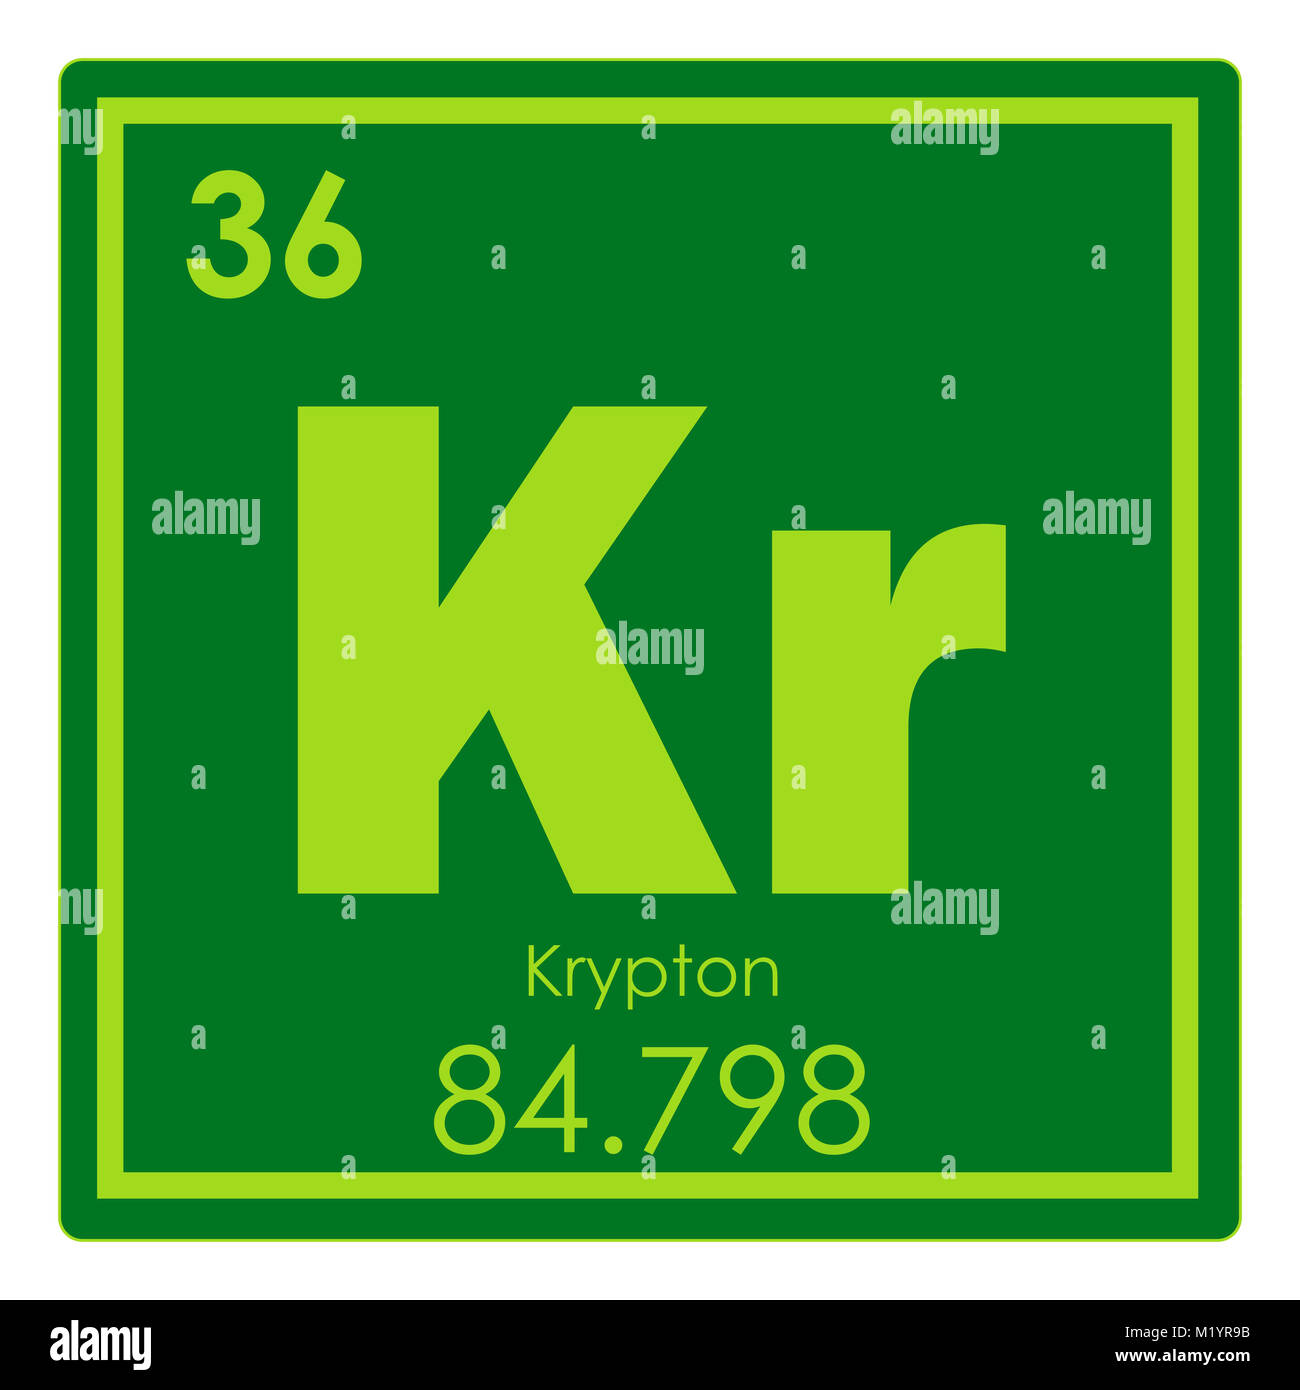 Krypton Chemical Element Stock Photos Krypton Chemical Element